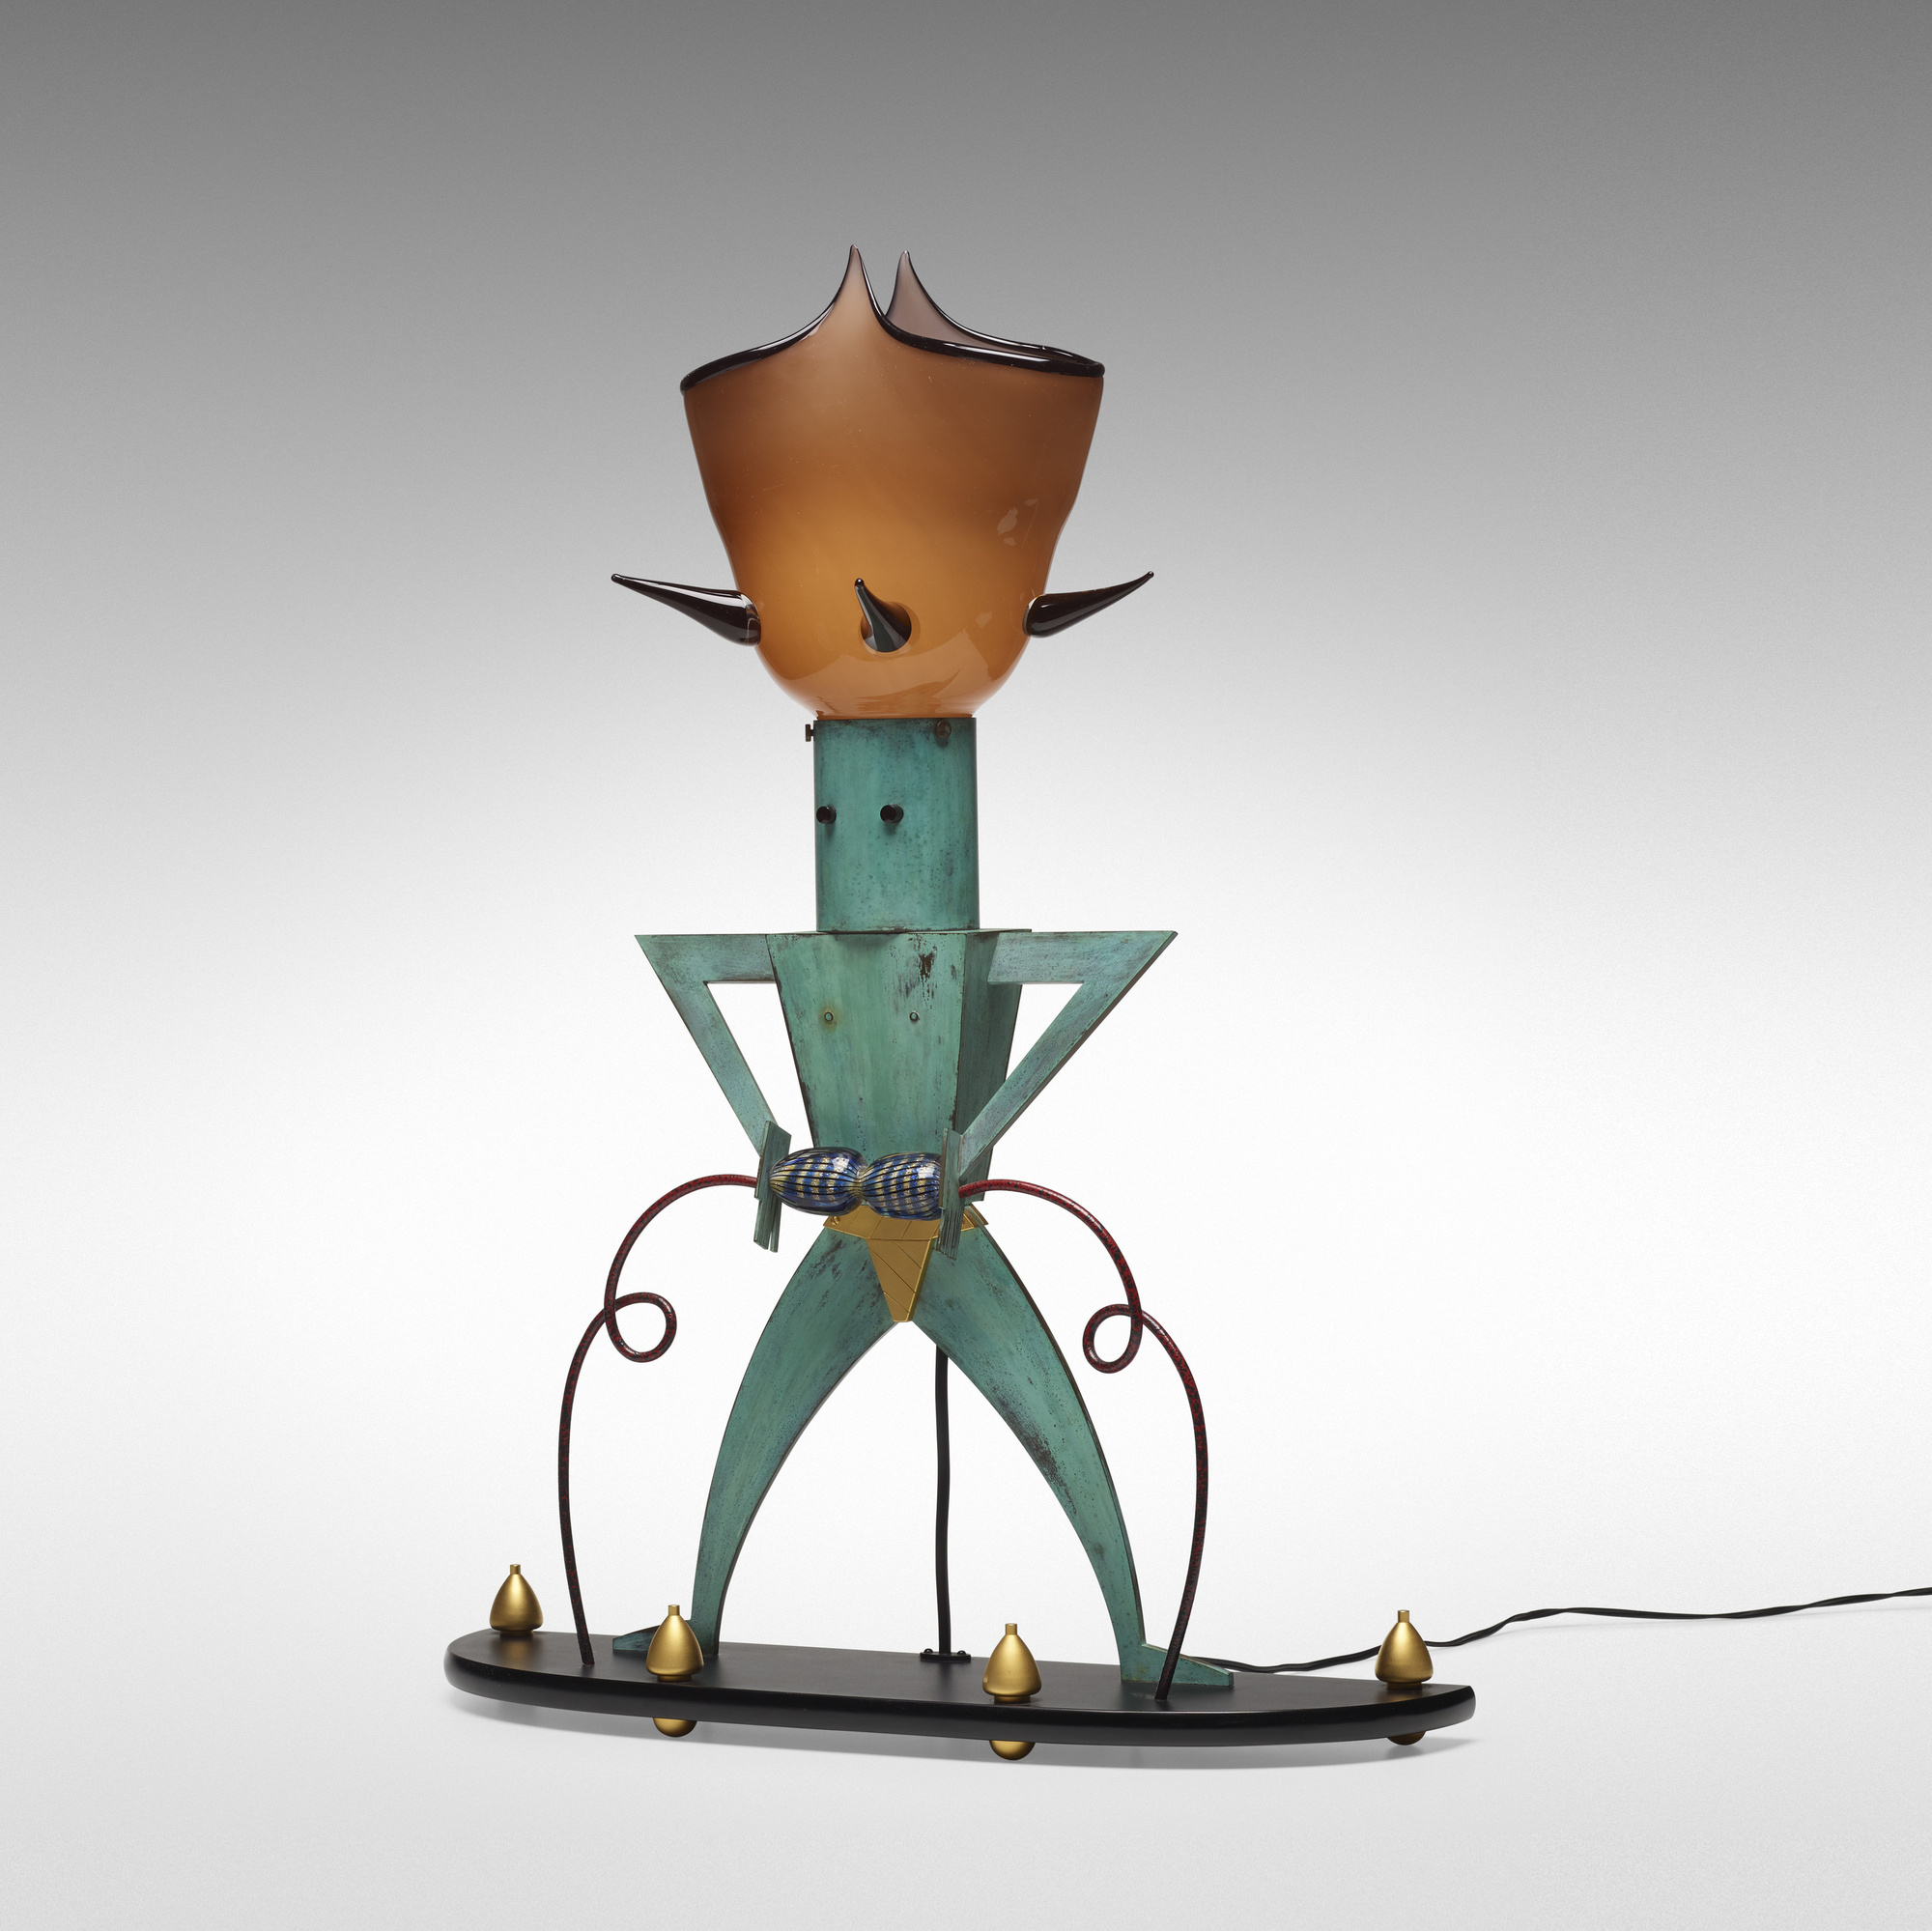 171: Dan Dailey / Magician lamp (1 of 3)